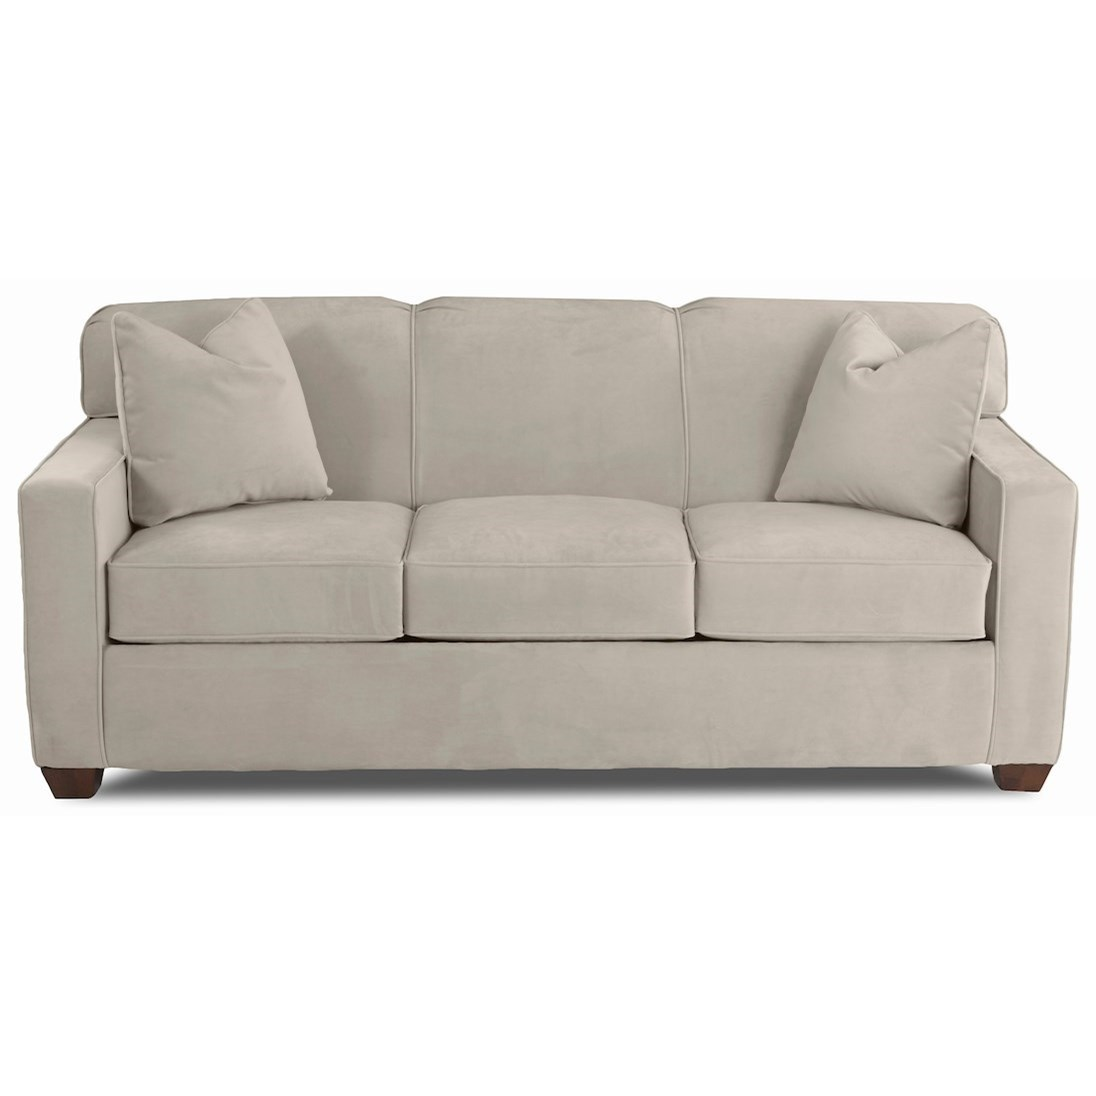 Sofa Tight Back Tufted Tight Back Linen Sofa At 1stdibs Wesley